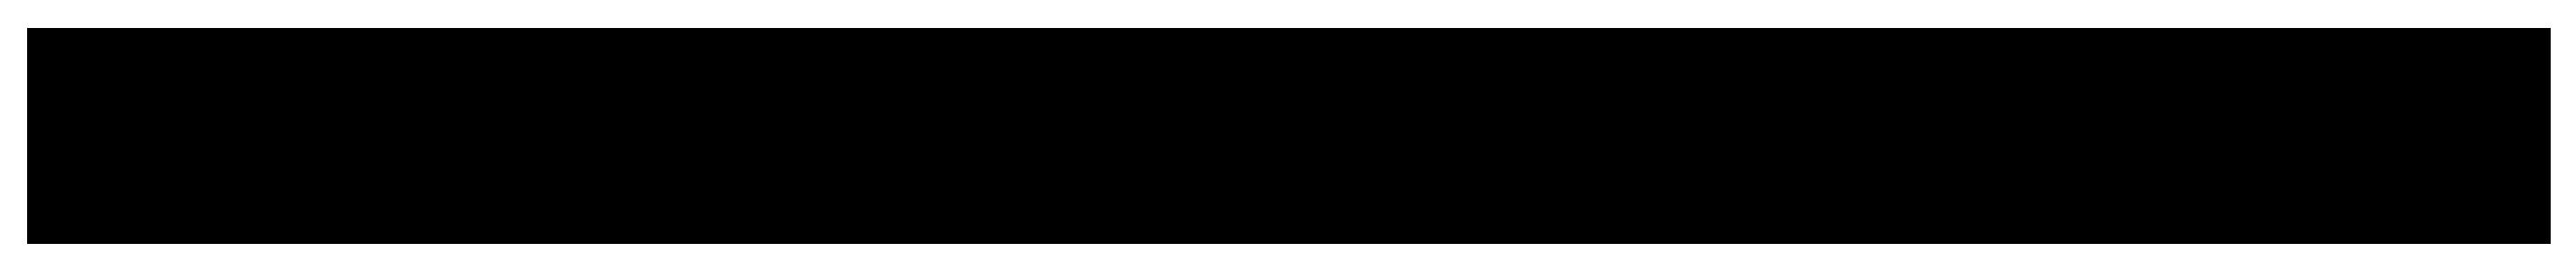 Entheon Biomedical Corp.